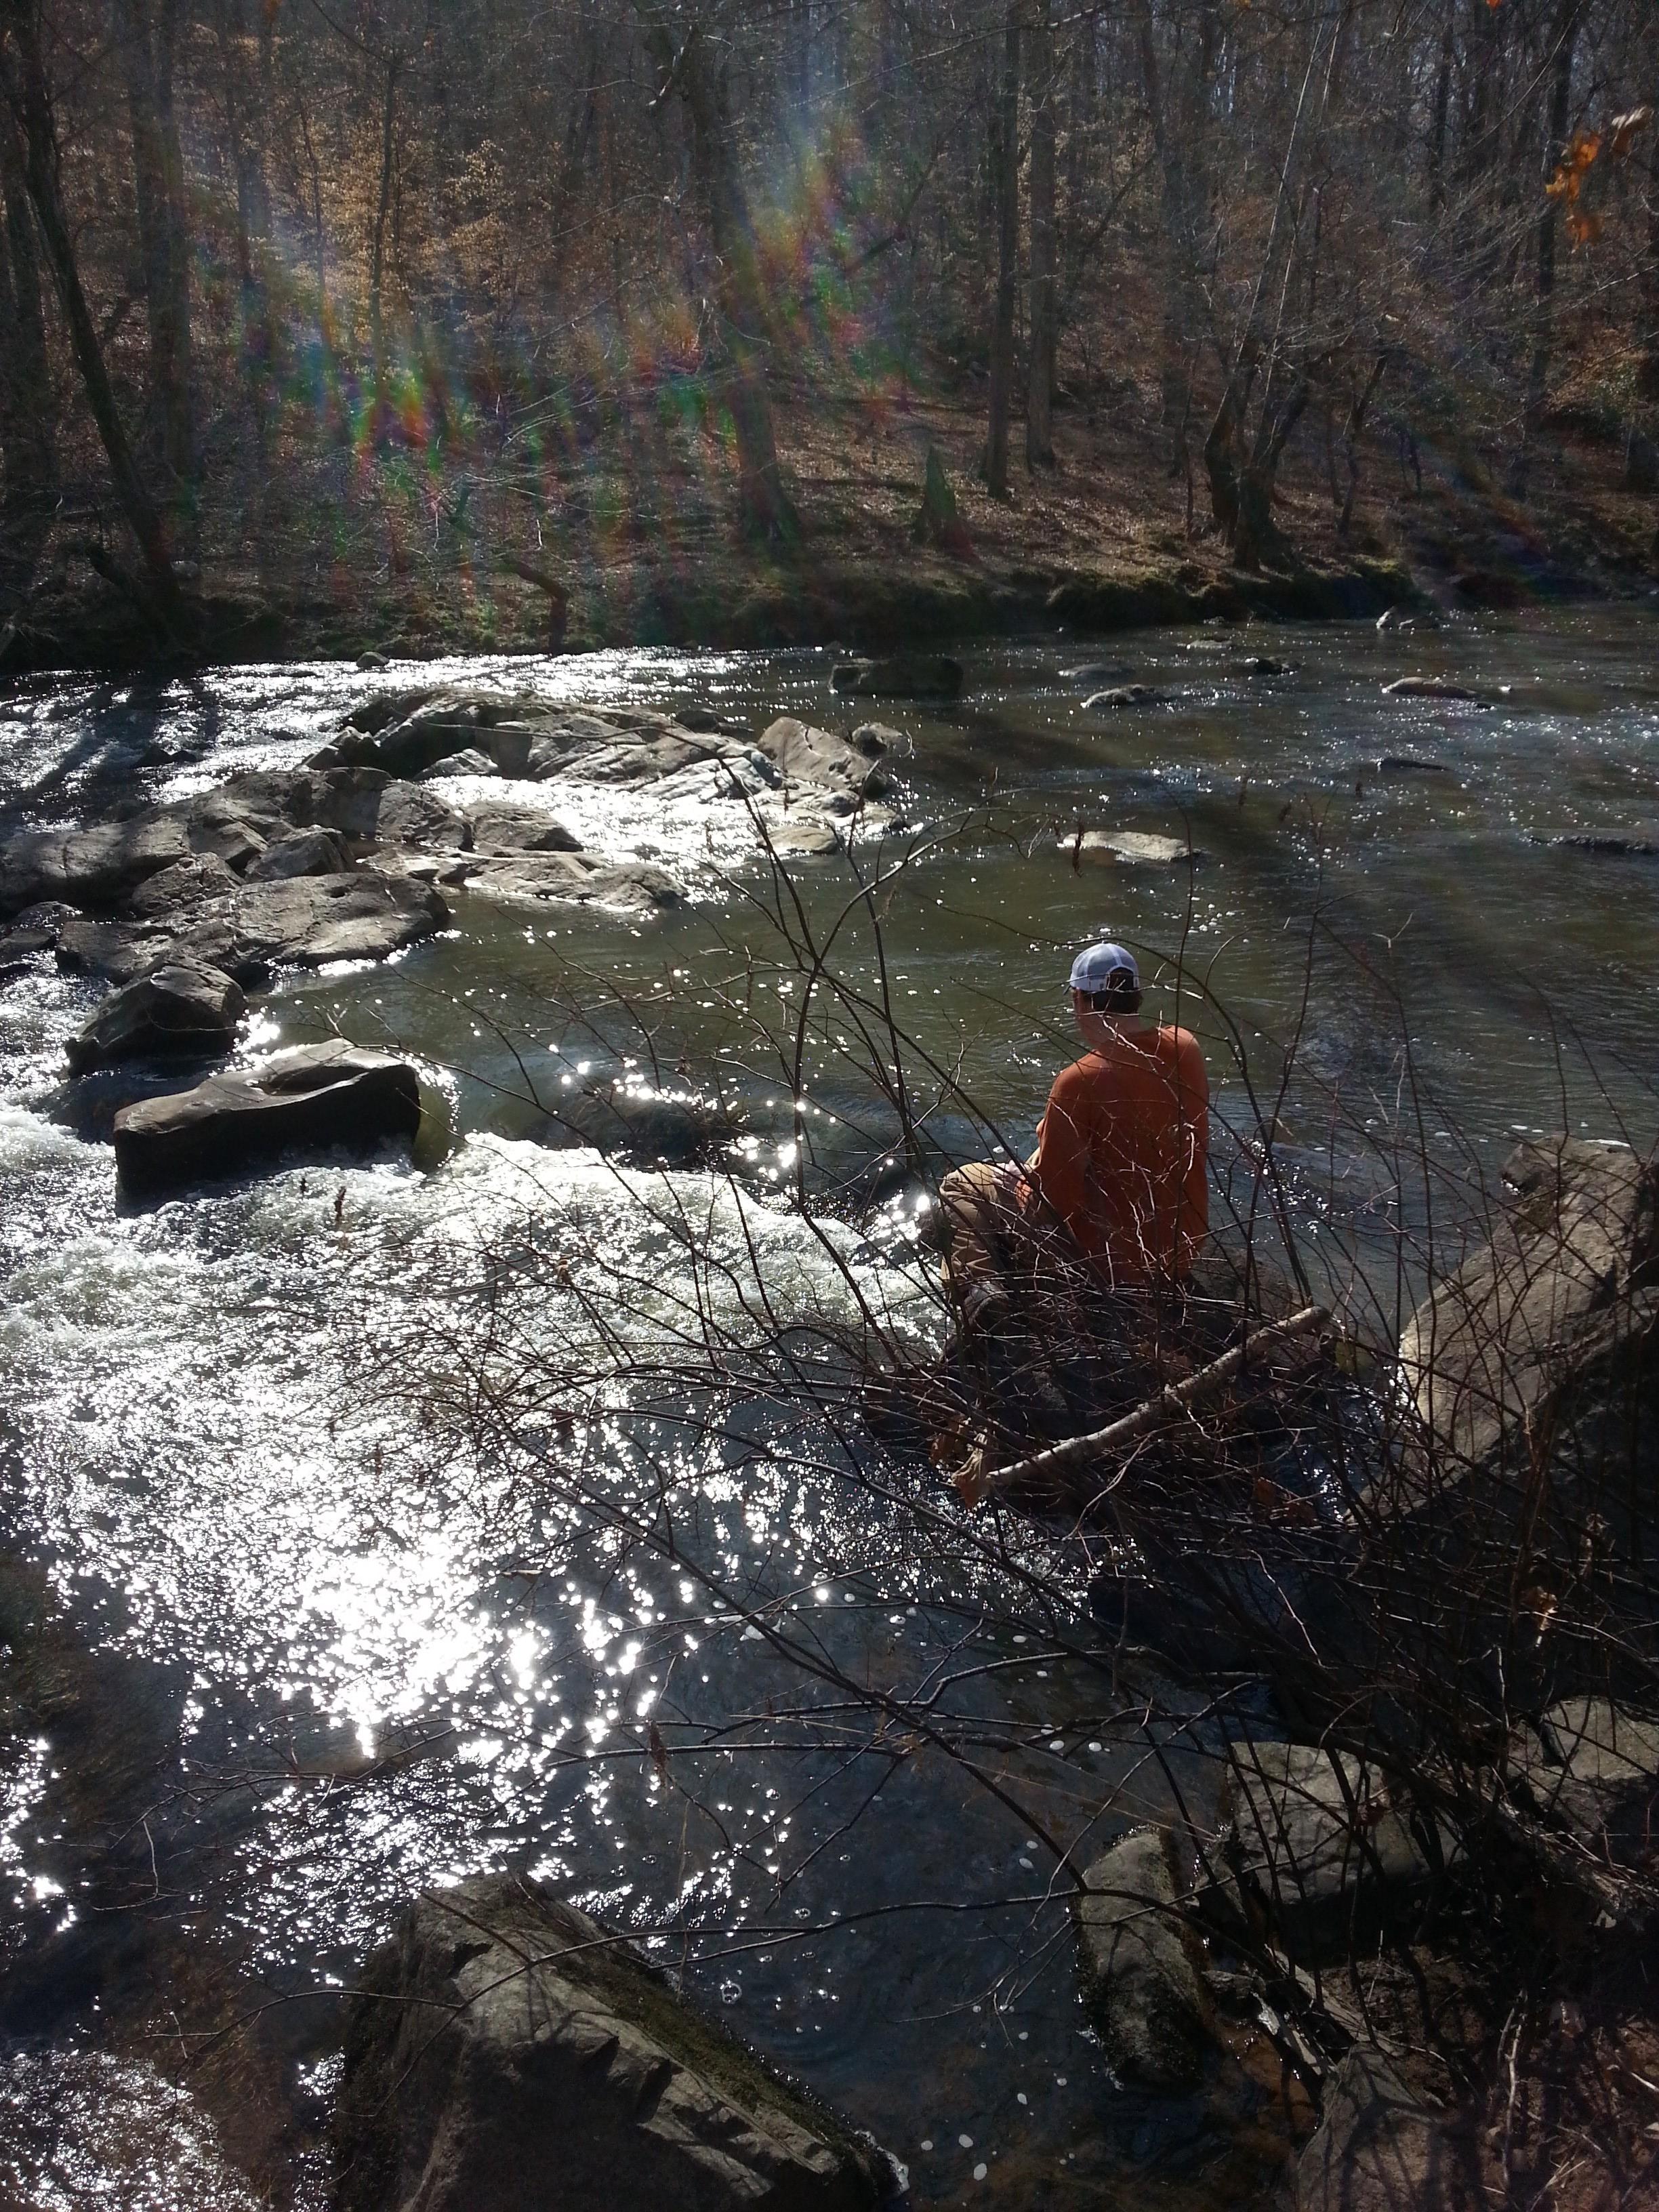 Buckquarter Creek at Eno River State Park